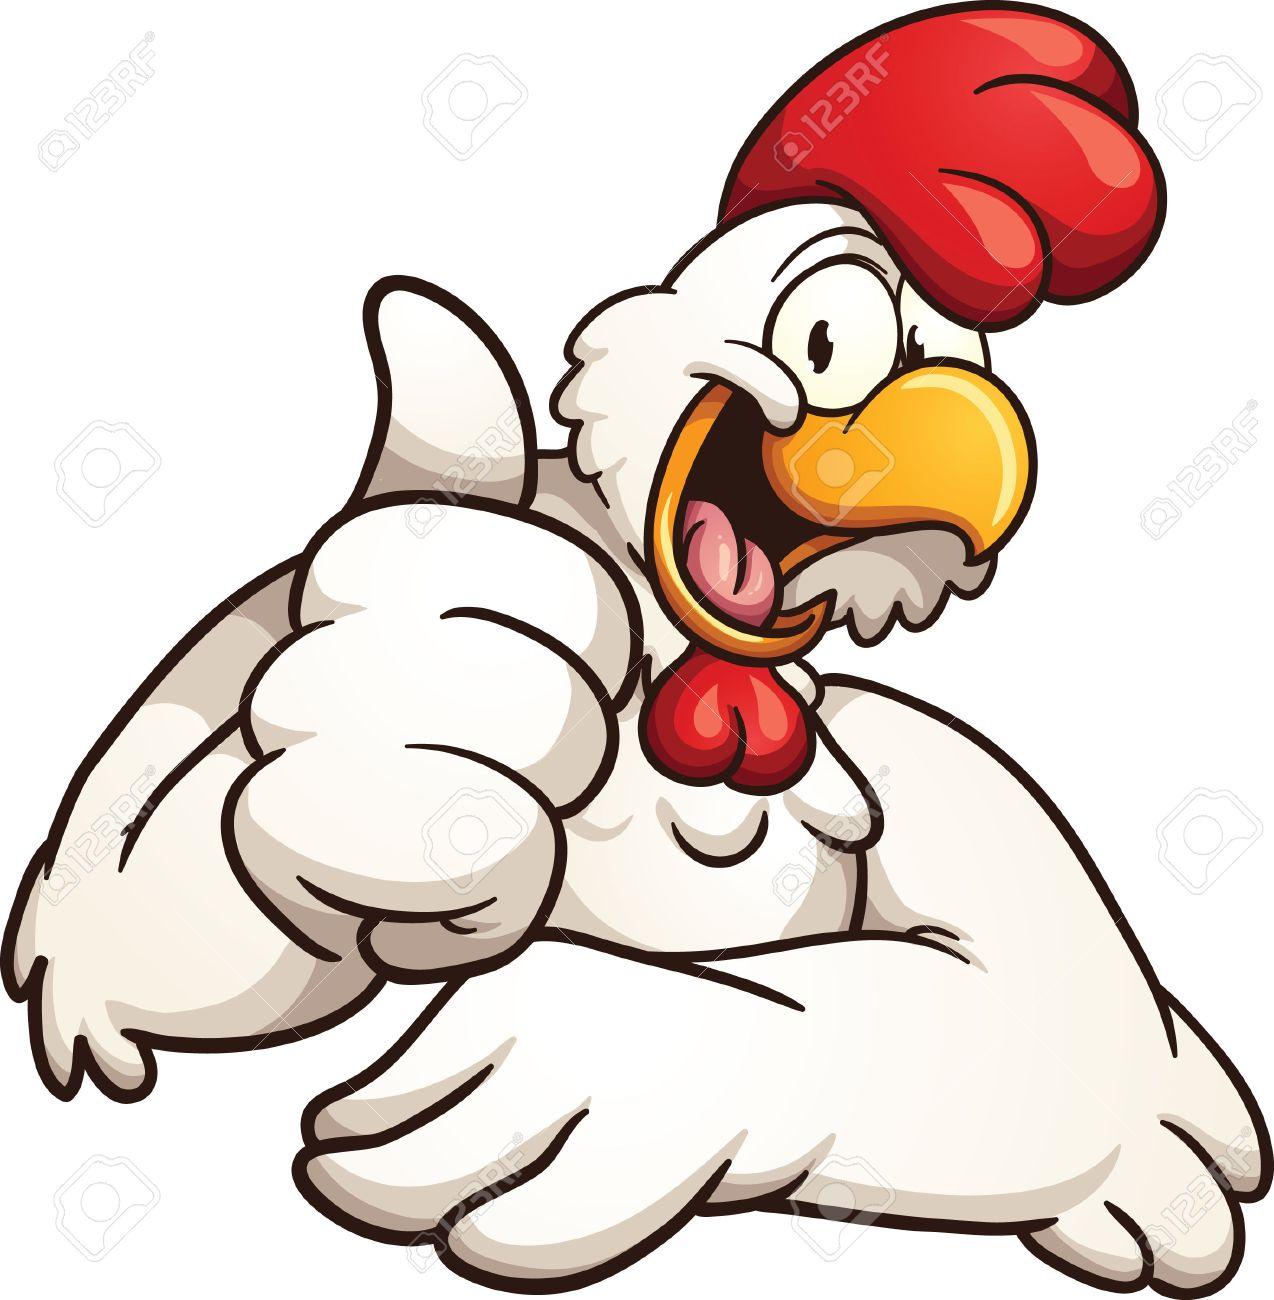 1274x1300 Cartoon Chicken Giving The Thumbs Up. Vector Clip Art Illustration